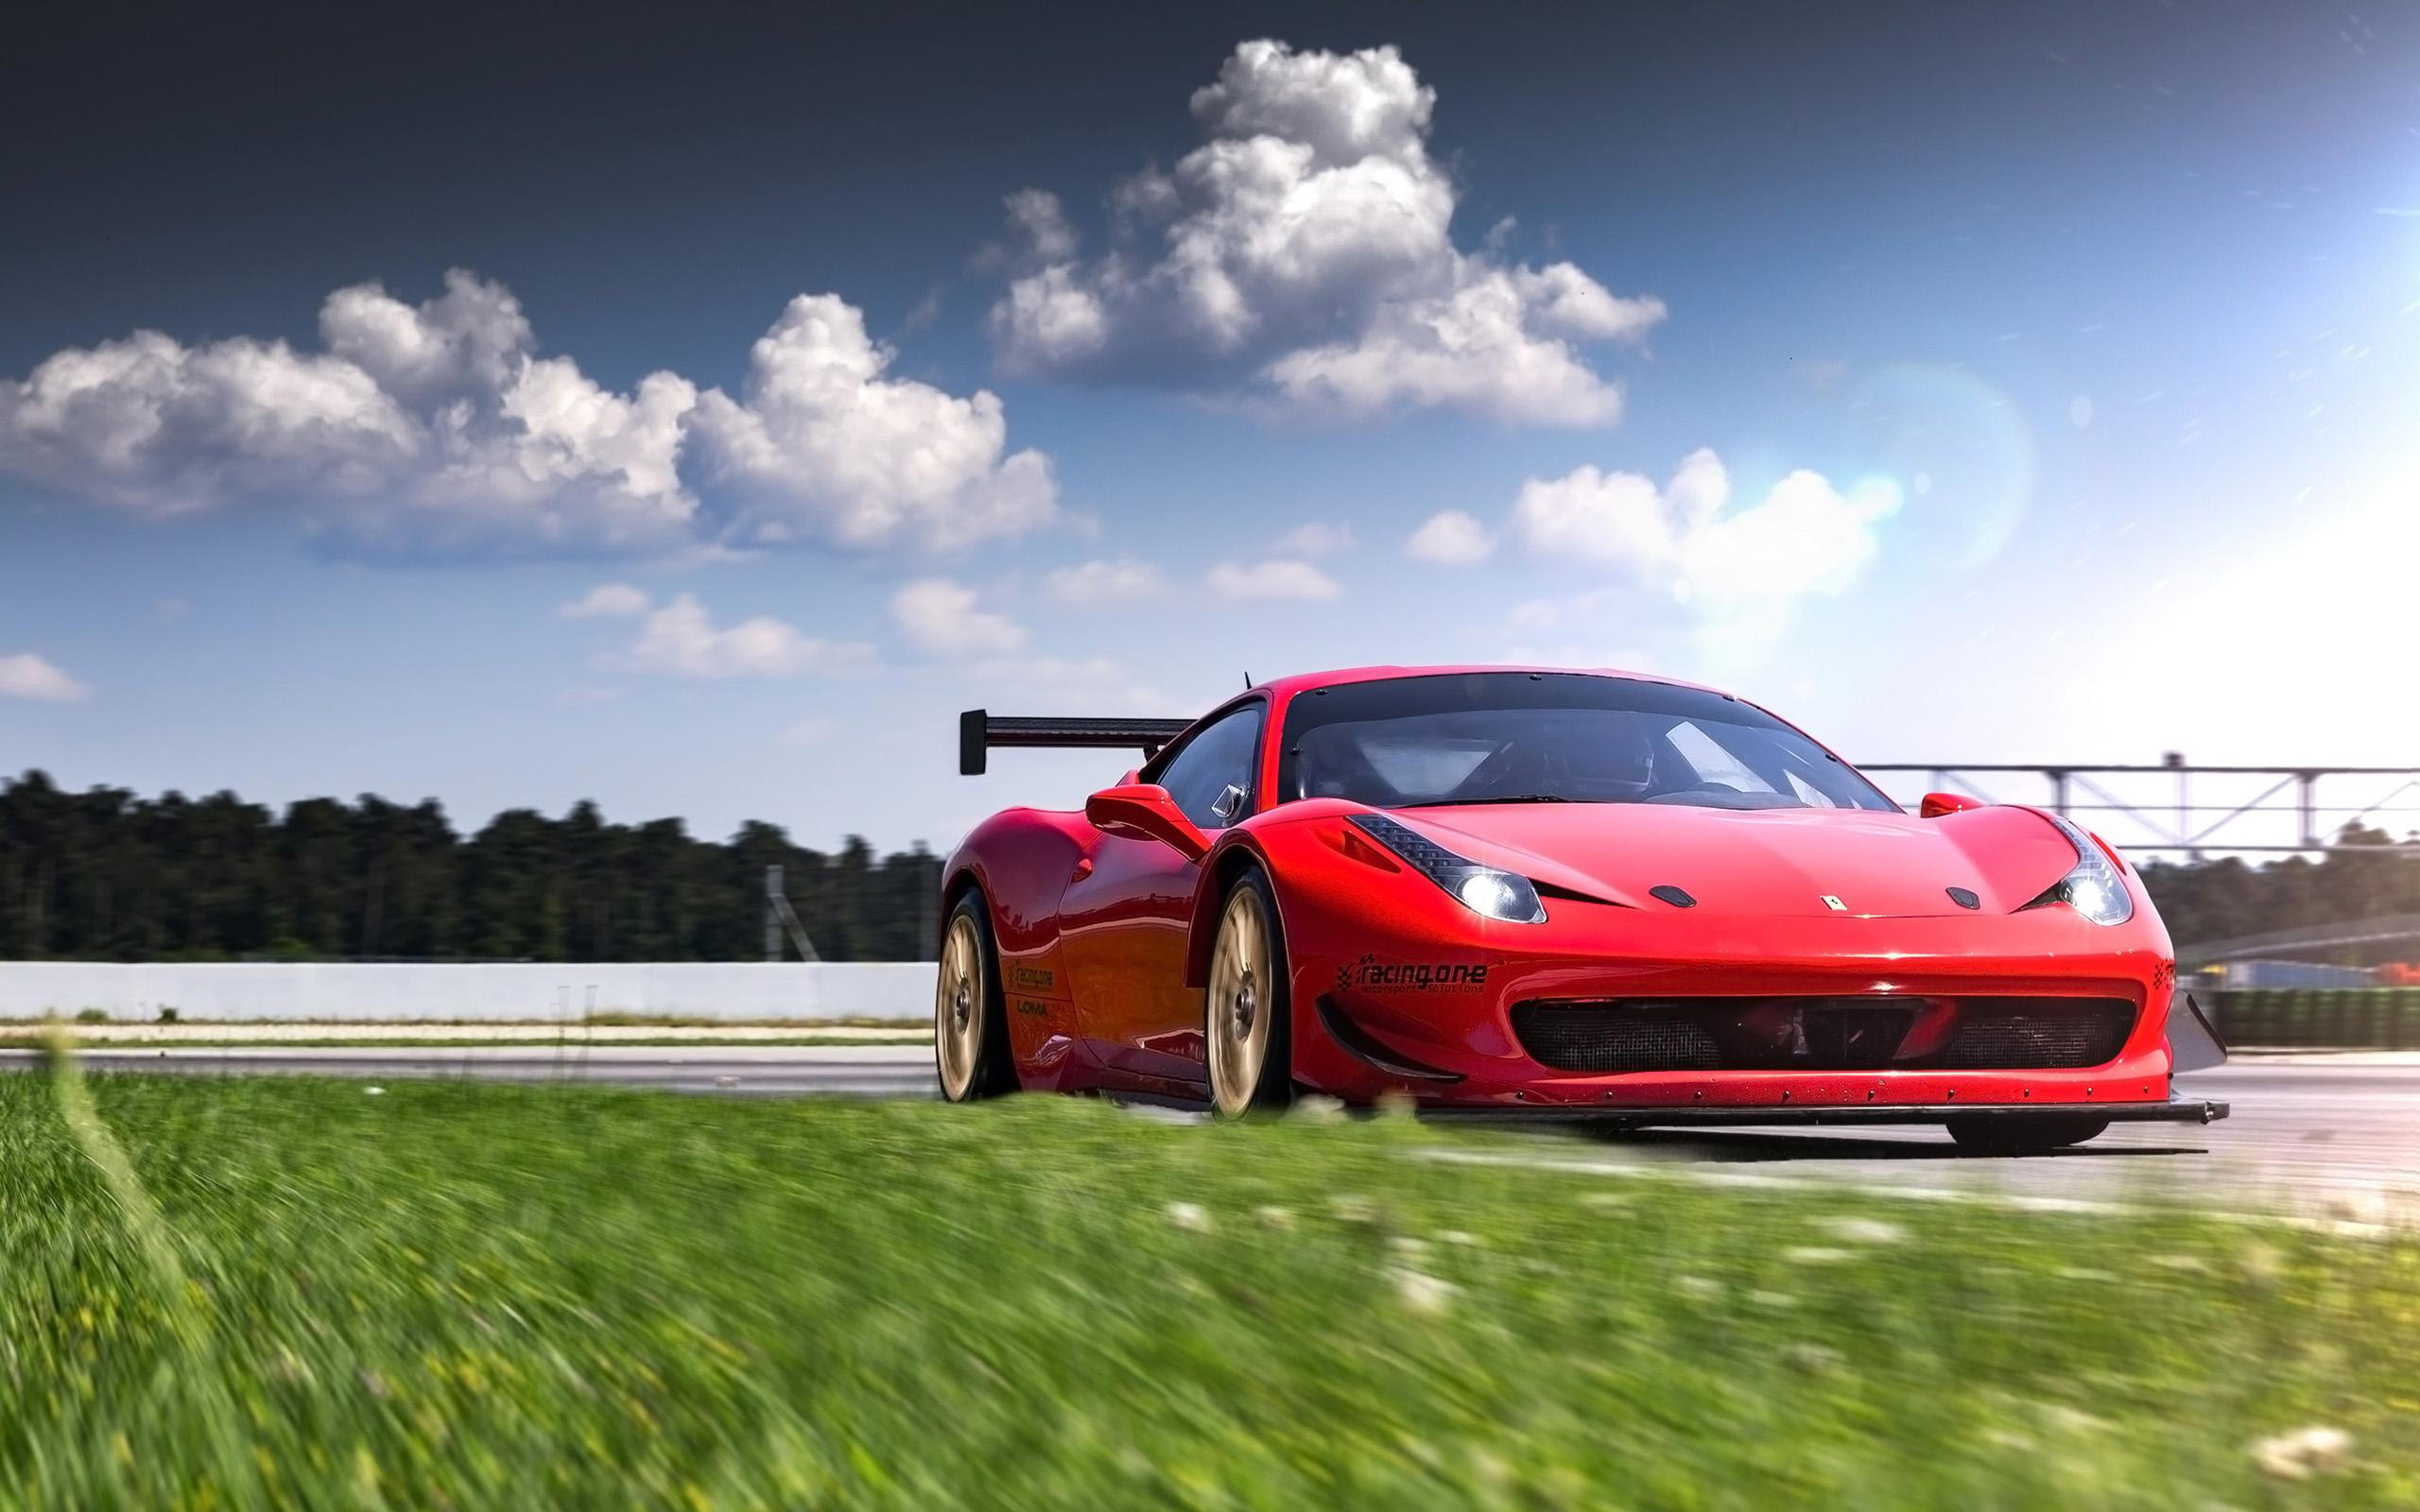 2016 Racing One Ferrari 458 Loma Wheels 2 Wallpaper Hd Car Wallpapers Id 6728